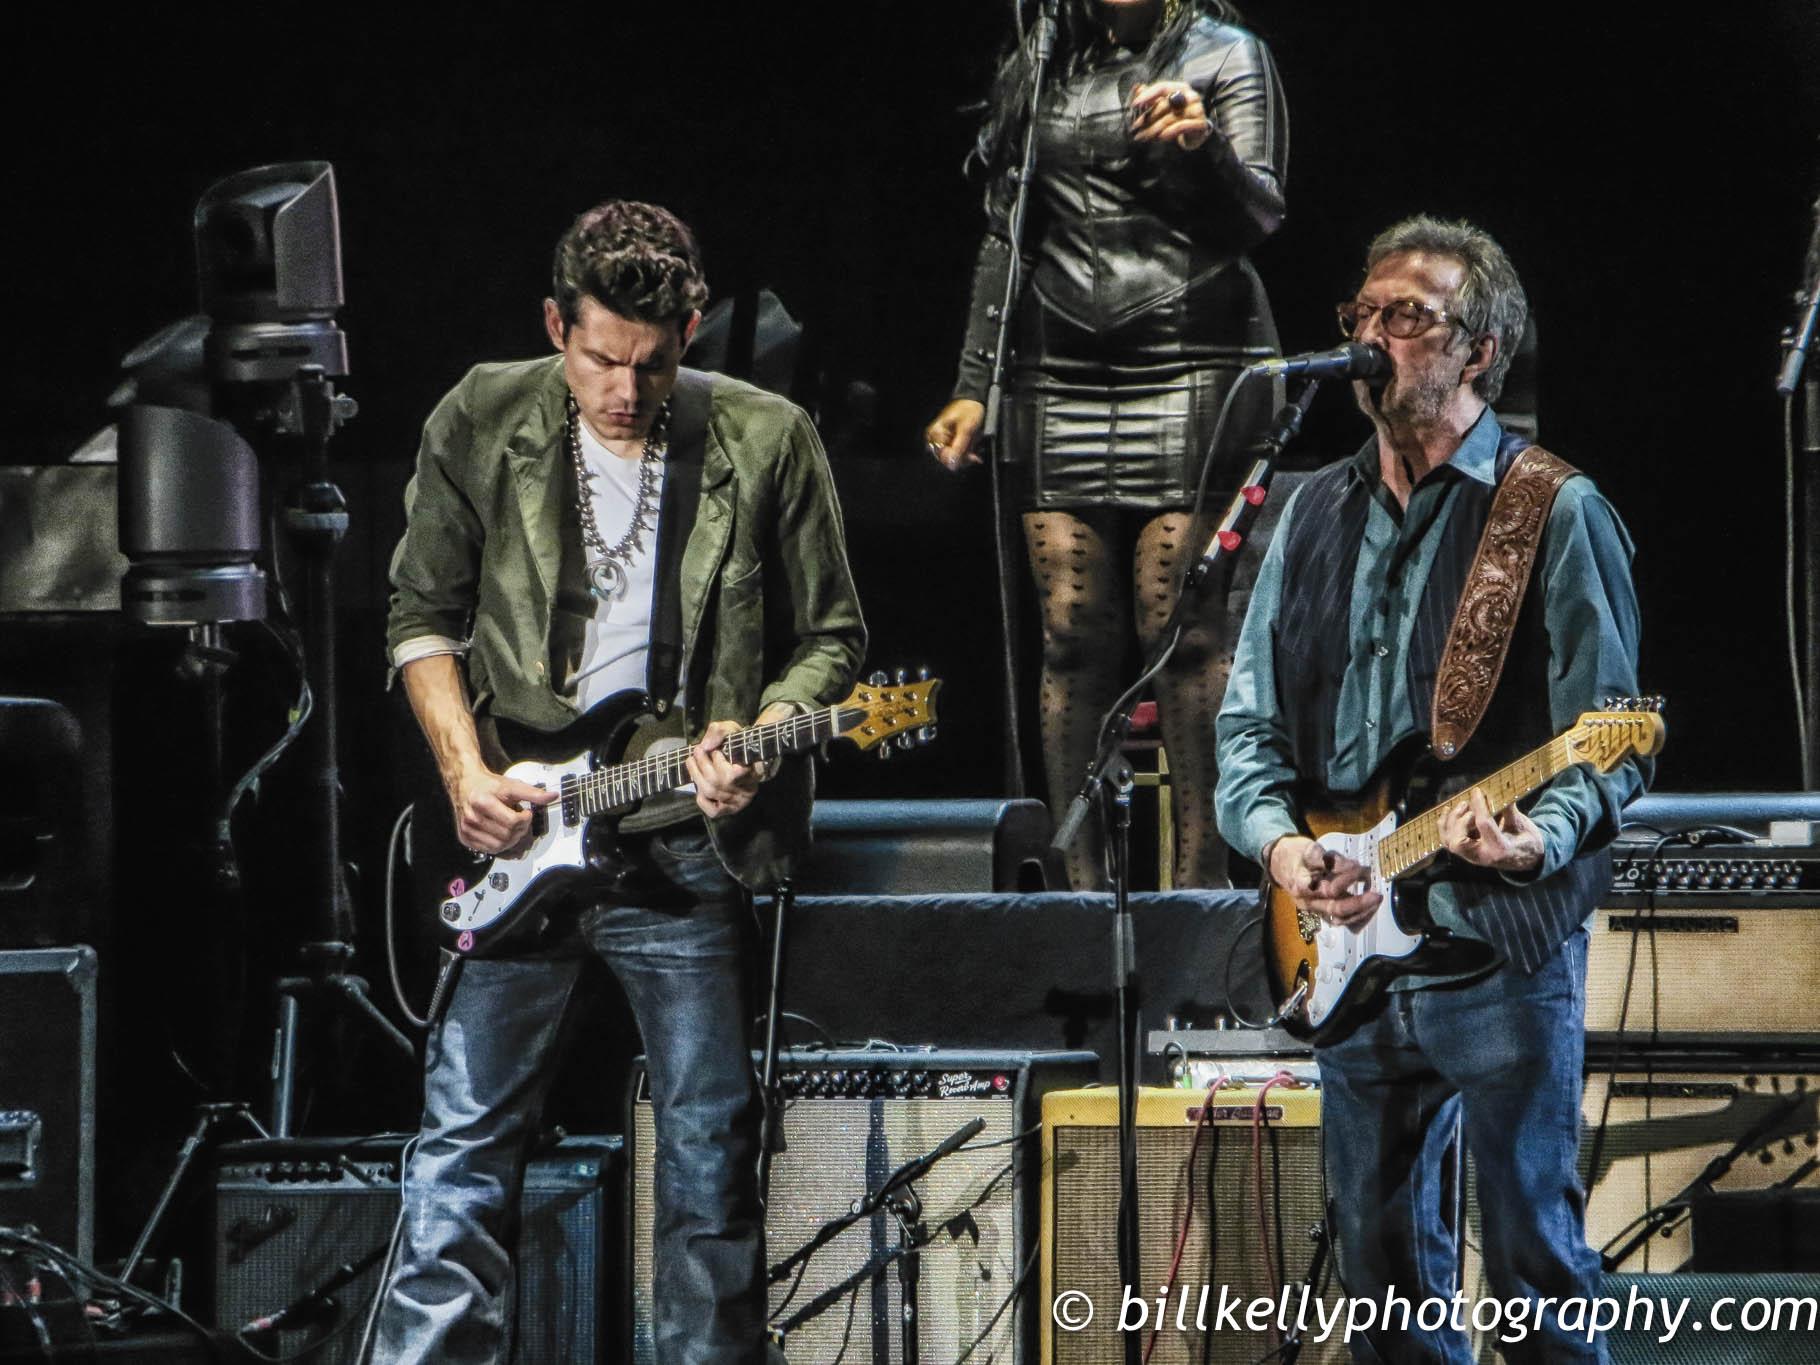 Happy Birthday Eric Clapton Bill Kelly Photography